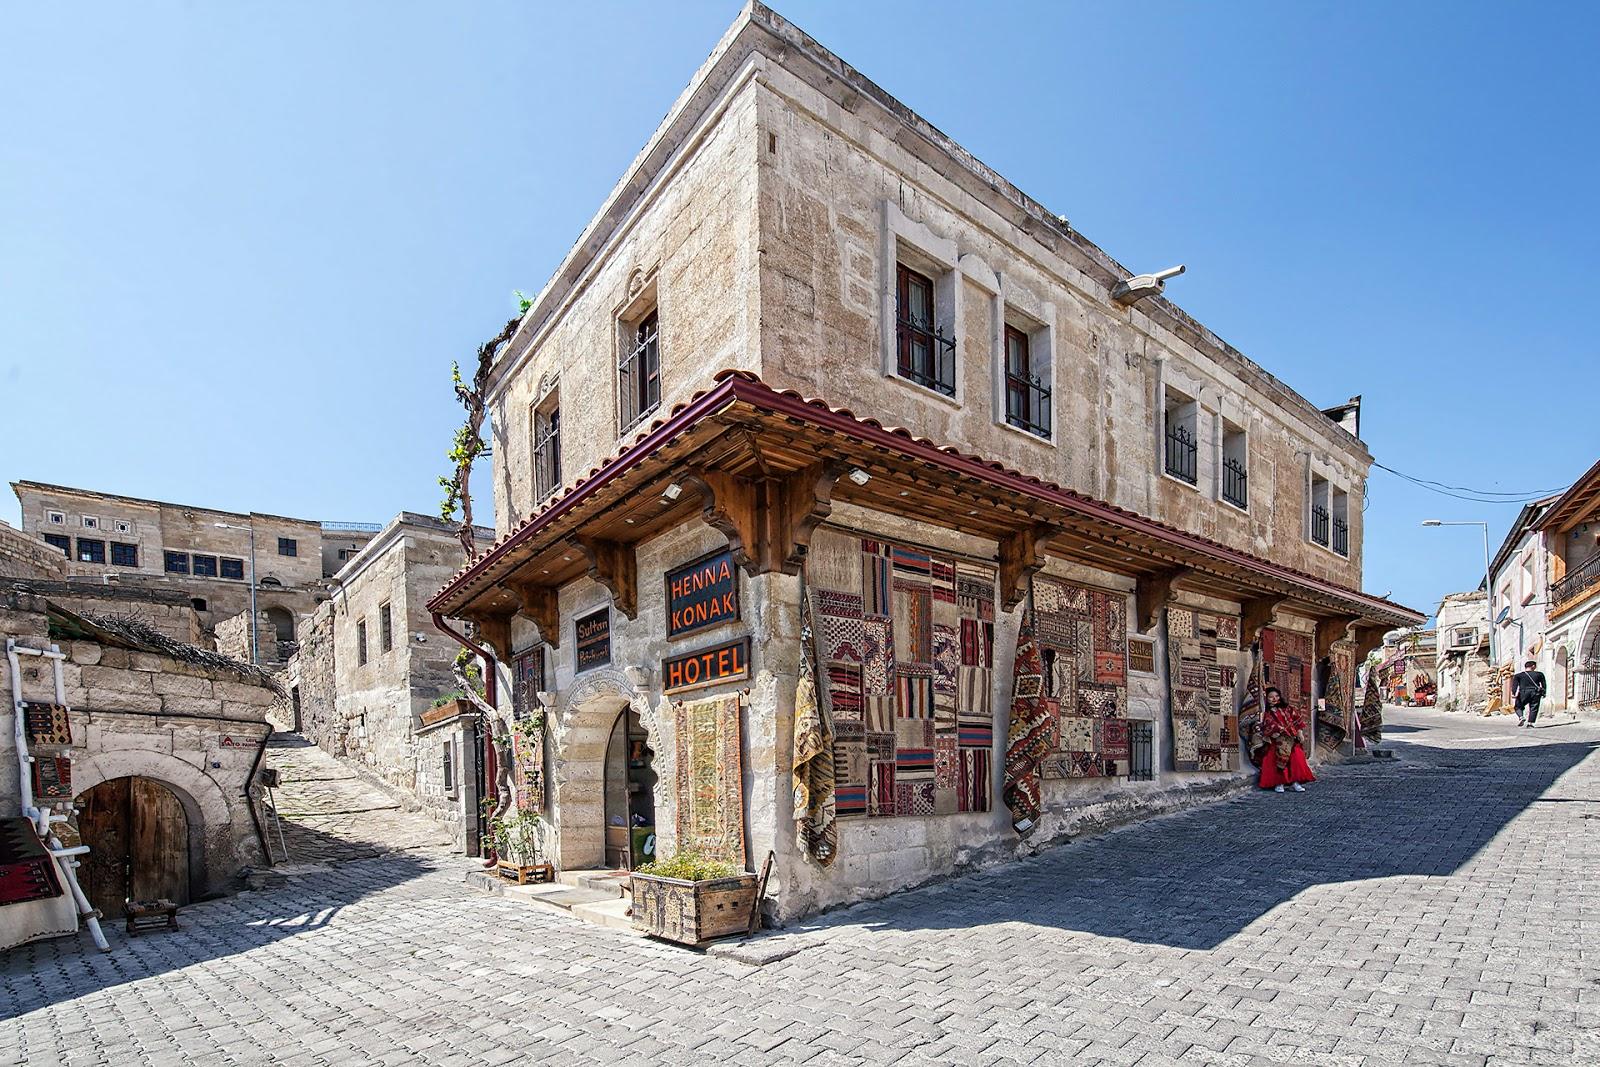 Turcja-Henna Konak Hotel